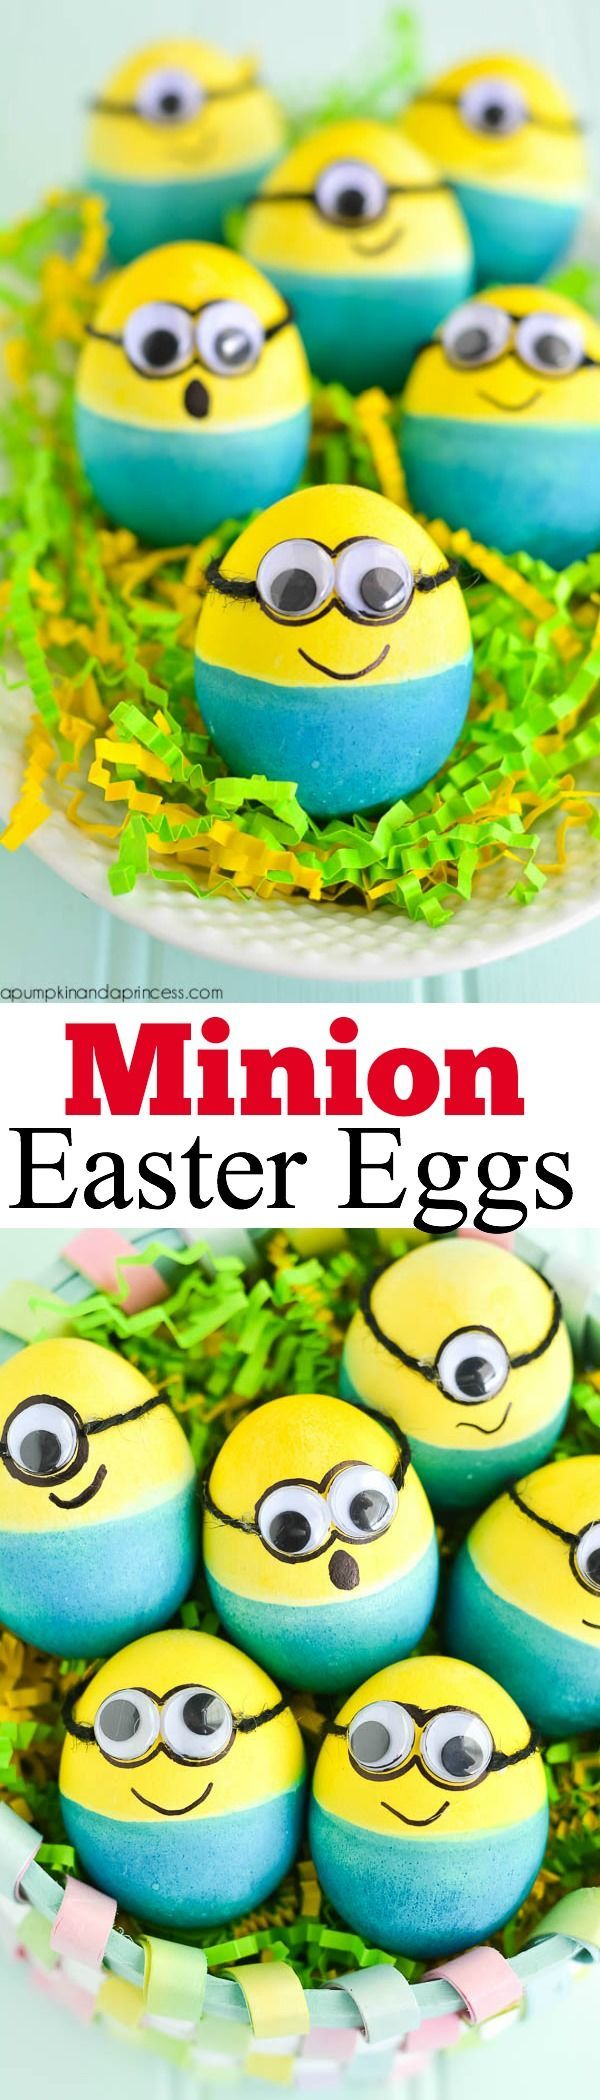 Minion Easter Eggs easter diy diy ideas easy diy kids crafts minion minions easter crafts easter craft easter eggs crafts for kids easter gifts egg dying